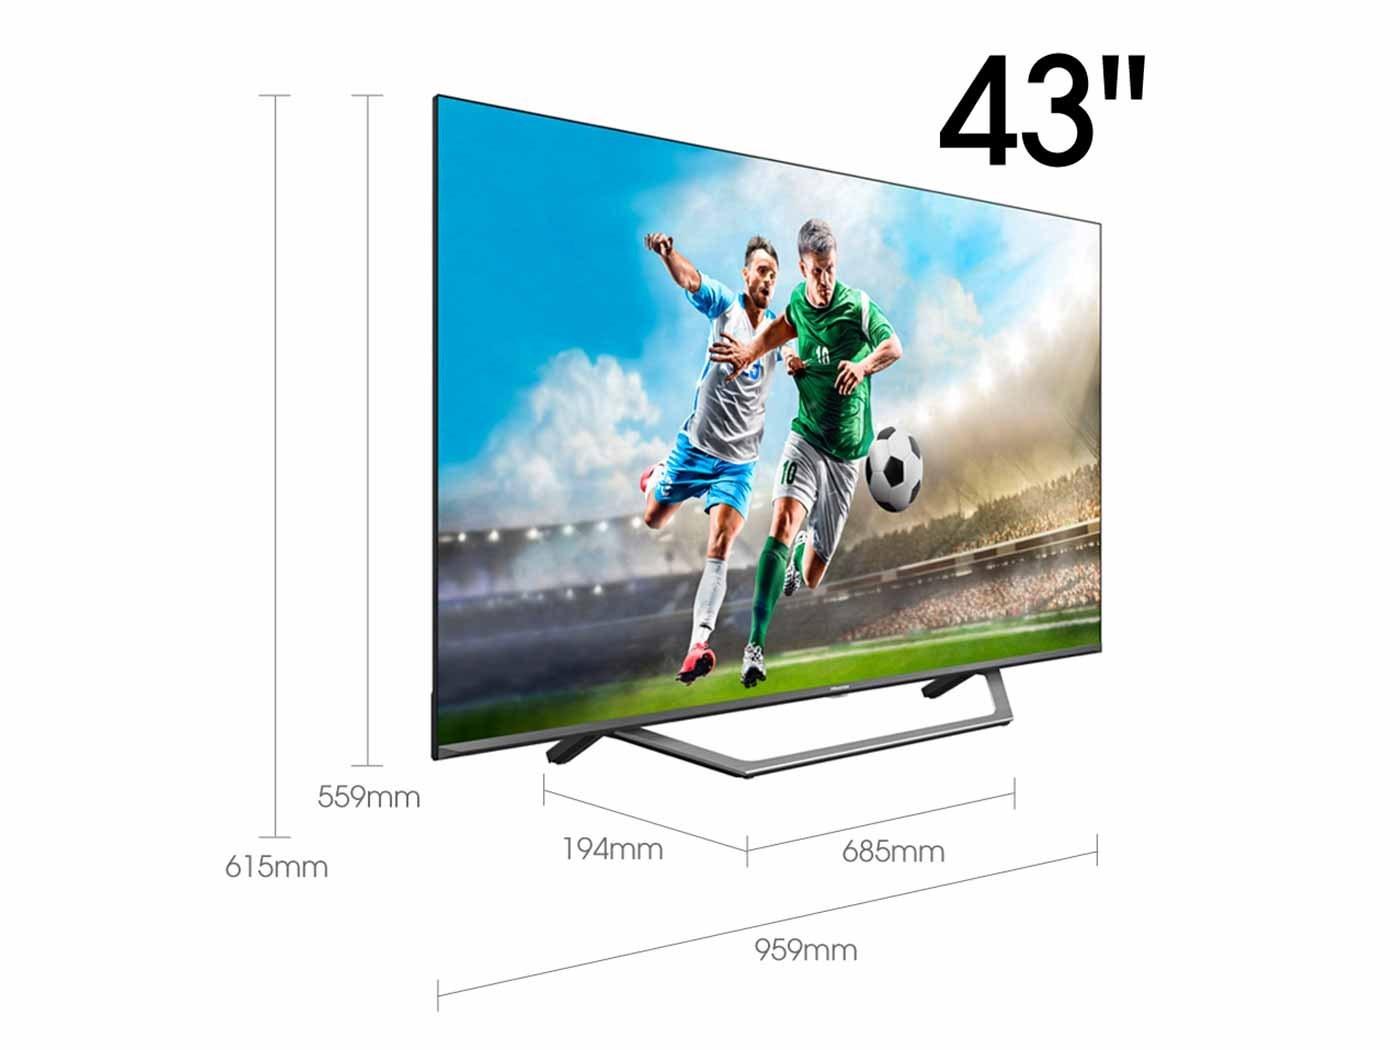 43A7500F - TELEVISION 43' HISENSE 43A7500F 4K UHD HDR SMART TV IA